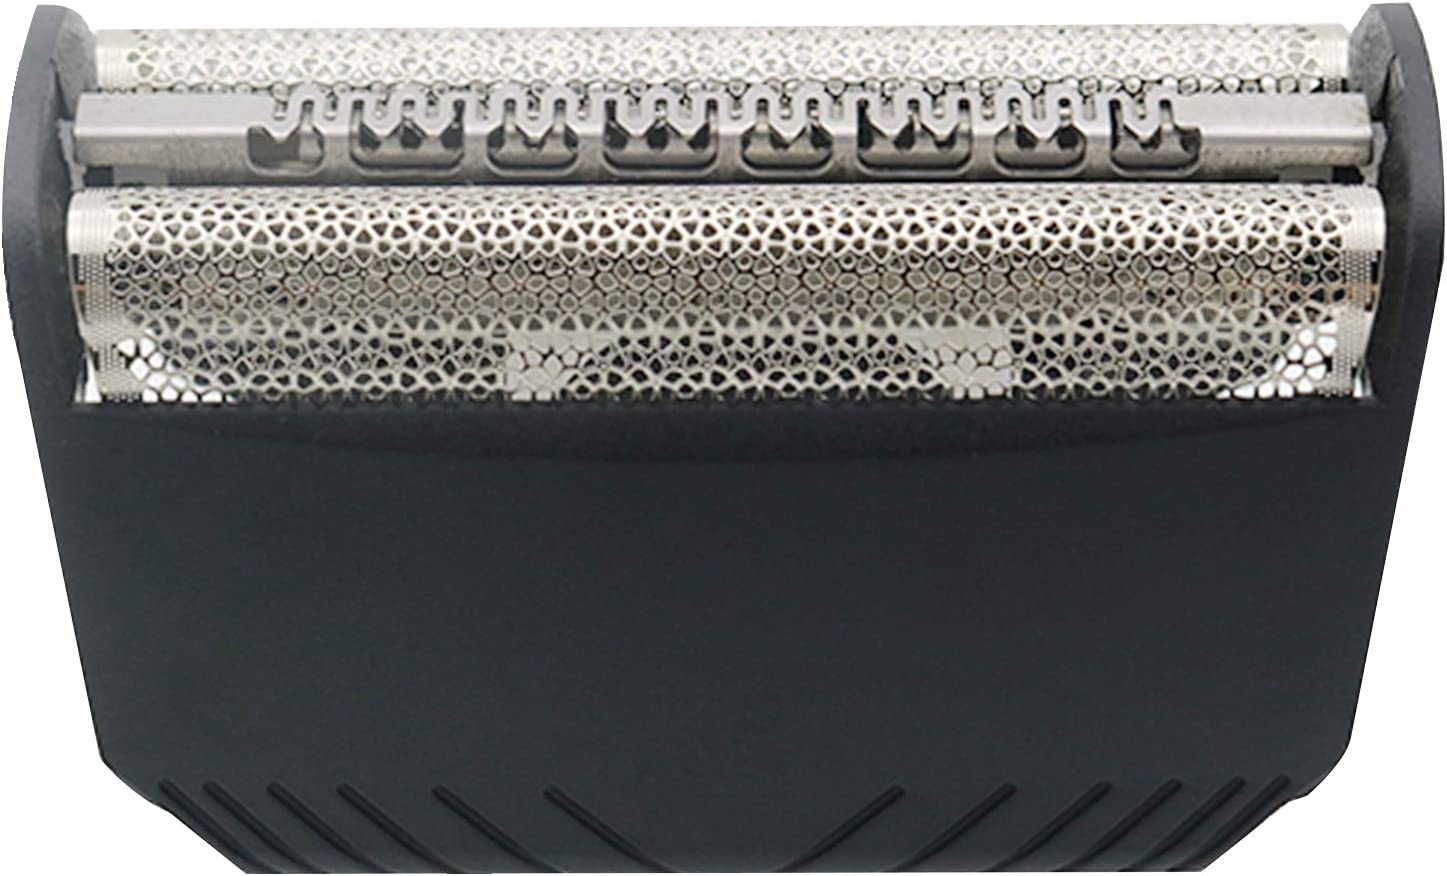 Foil Compatible para Braun, Serie 3 30B Cartucho de repuesto para afeitadora eléctrica Braun, para Serie 3 SmartControl 4000 Series 5495 7505 7520